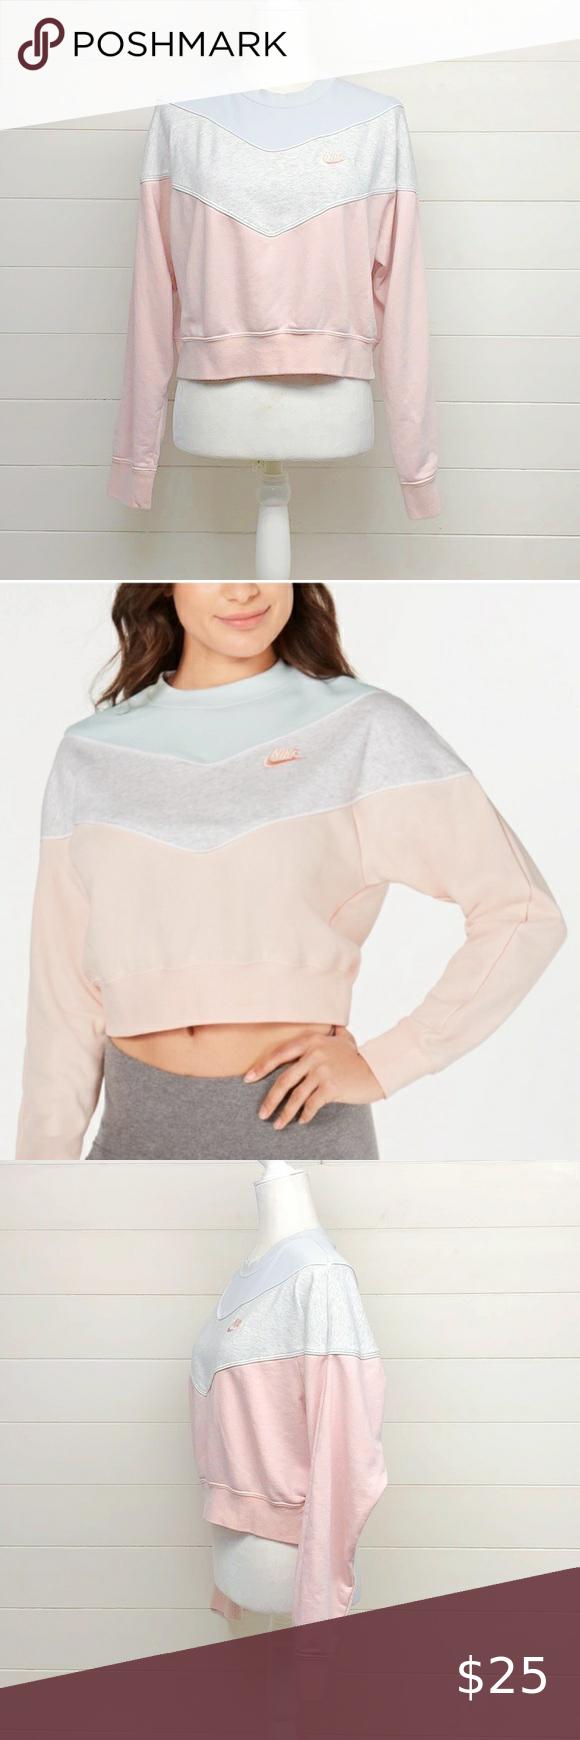 Nike Color Block Cropped Sweatshirt Nike Color Block Cropped Sweatshirt Size Large Size Down For Oversized Look Made I Crop Sweatshirt Color Block Sweatshirts [ 1740 x 580 Pixel ]